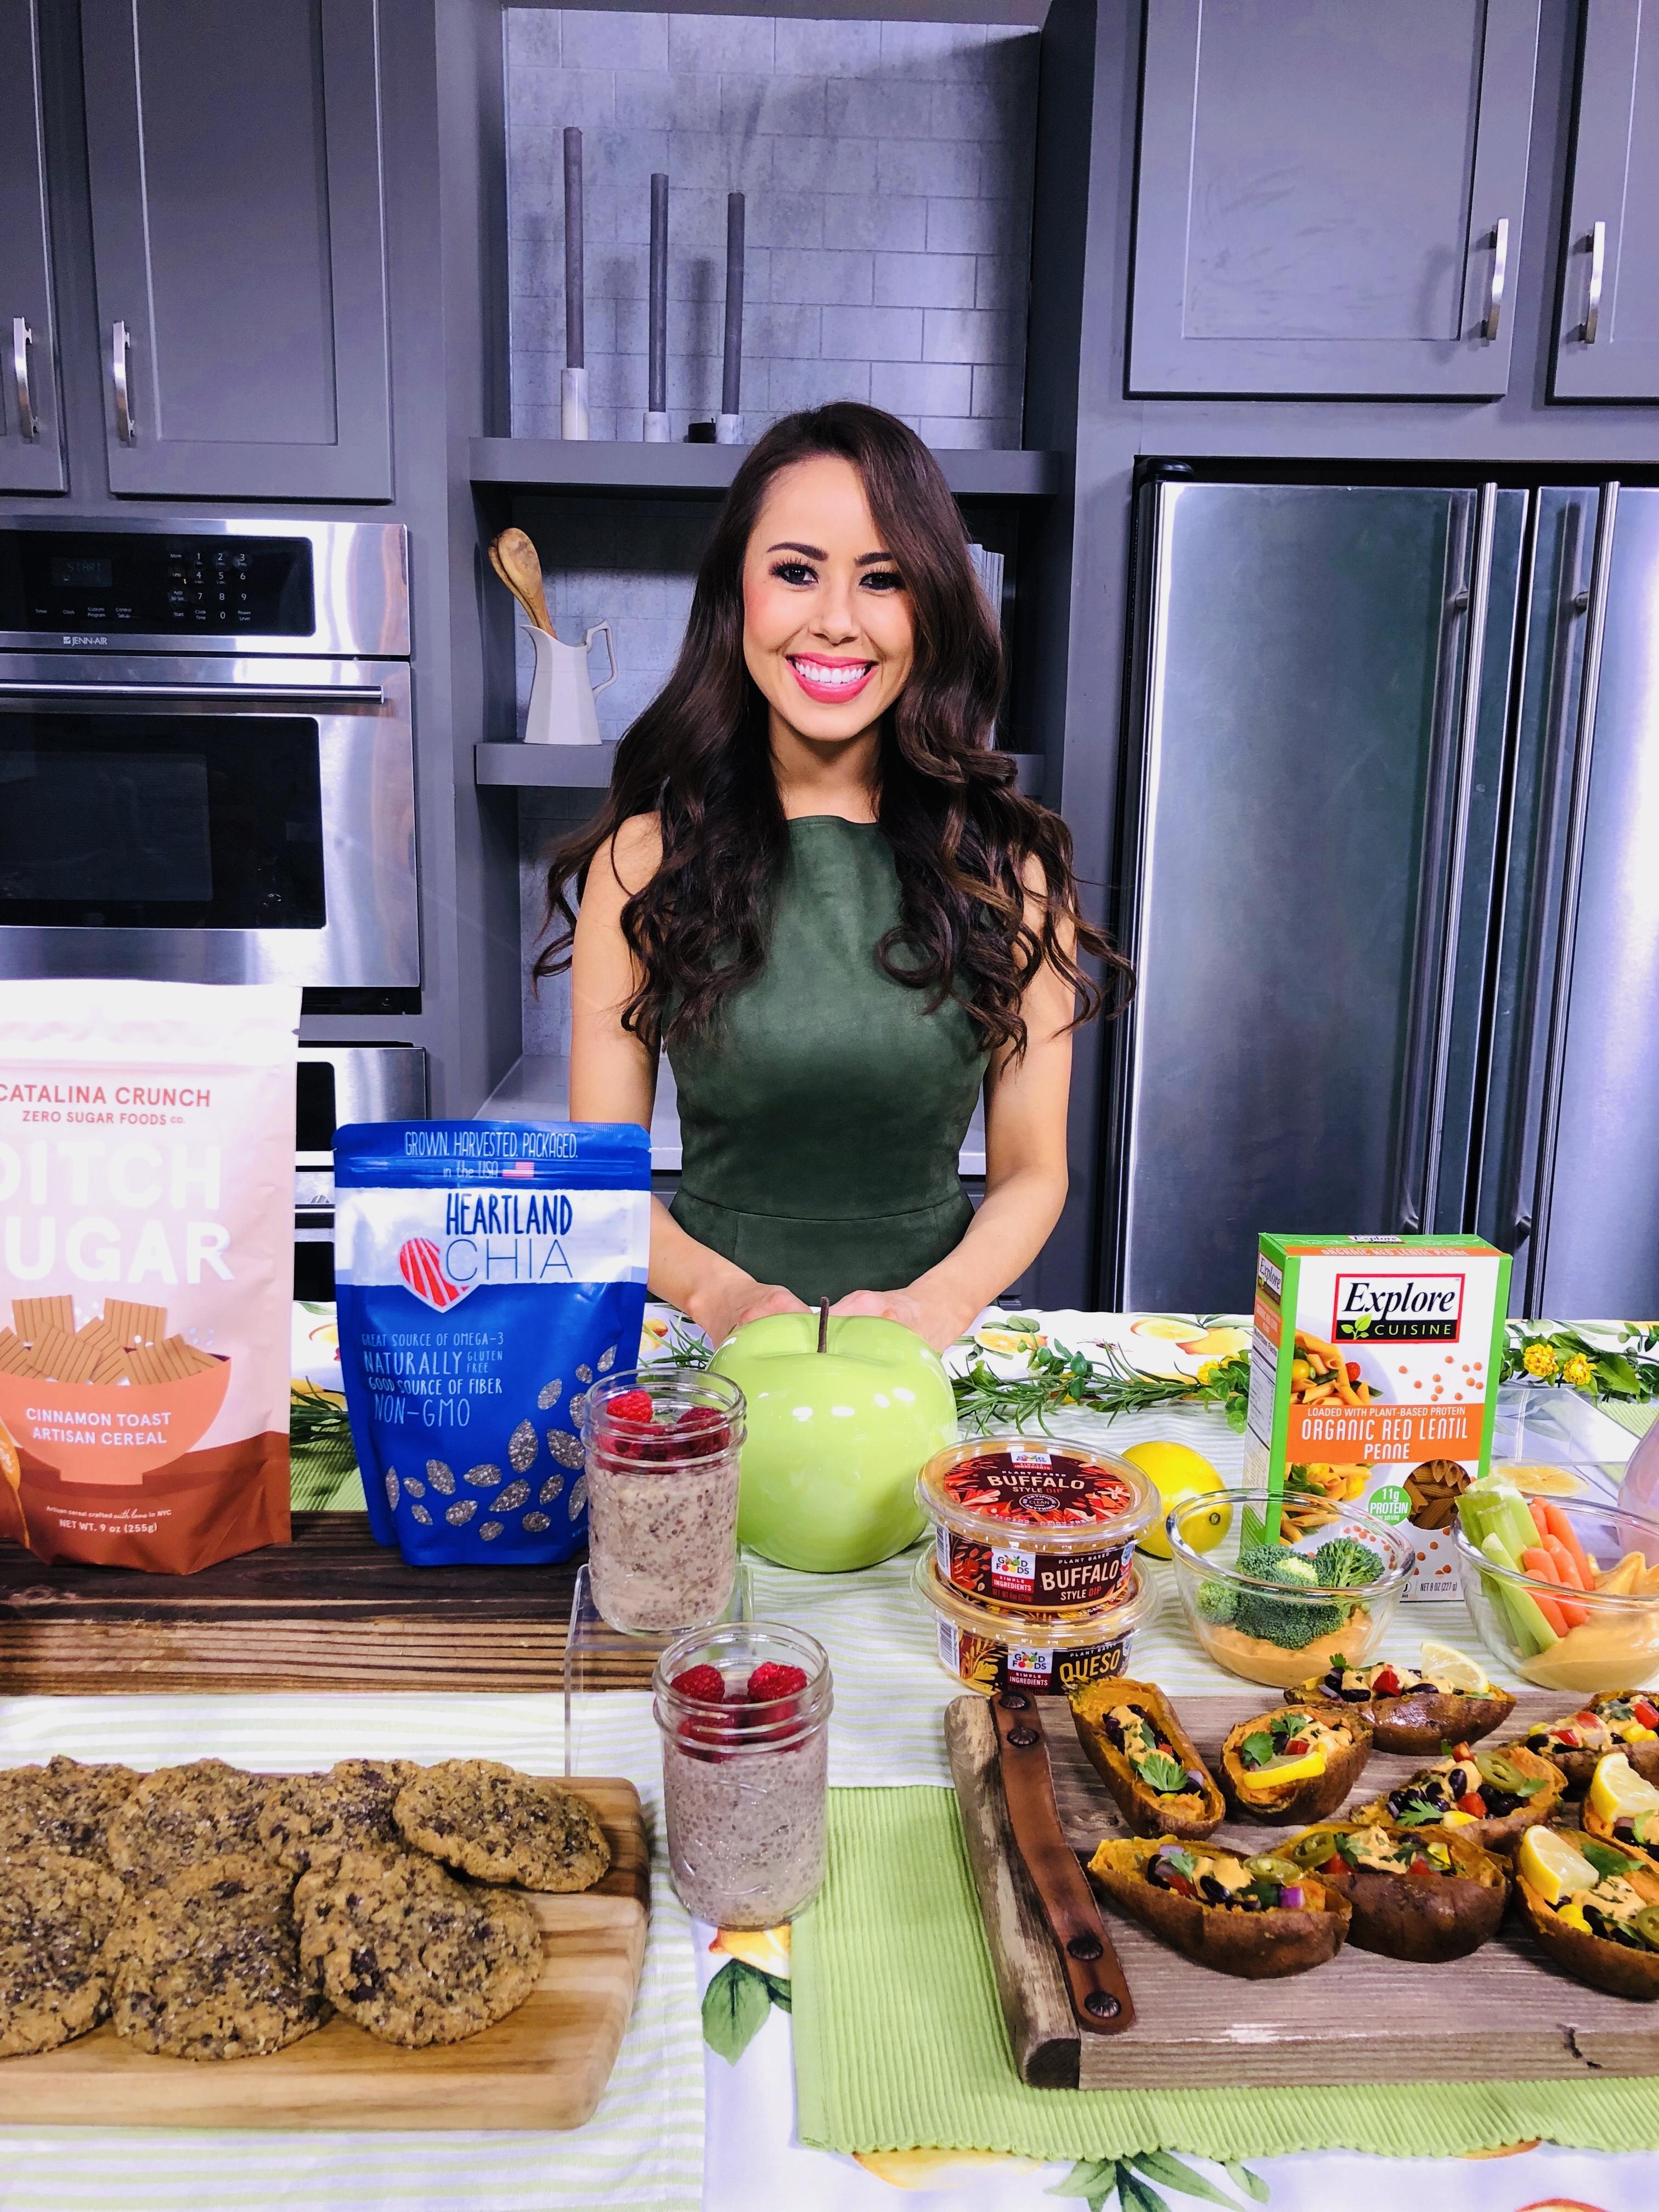 Catalina Crunch, Heartland Chia, Explore Cuisine Red lentil Pasta, Good Foods Plant Based Dips